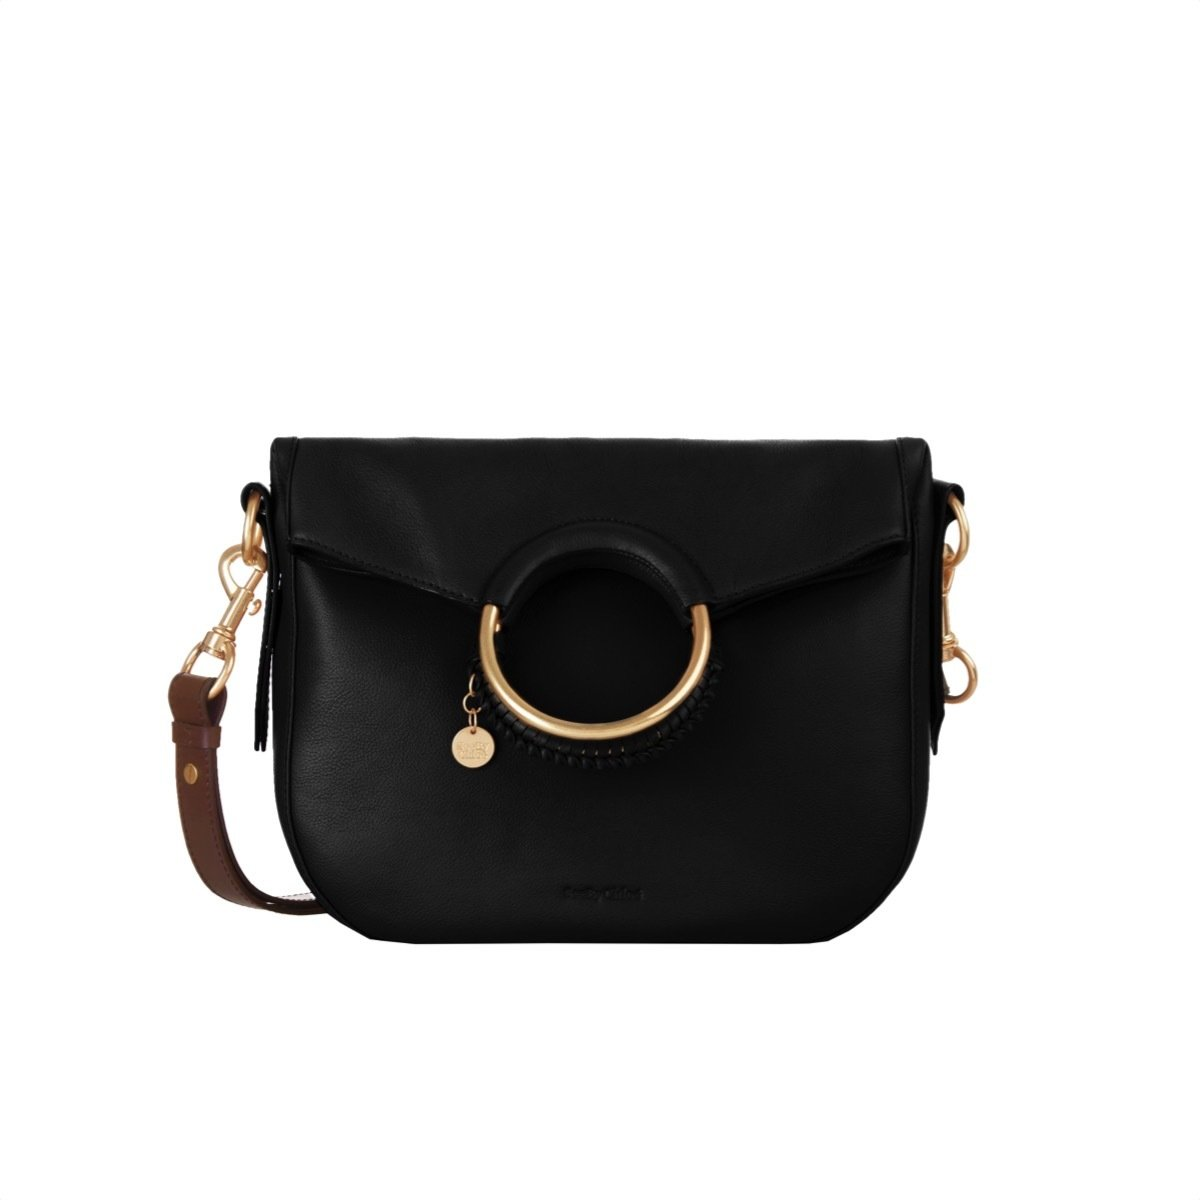 SEE BY CHLOÉ - Monroe Medium Day Bag - Black